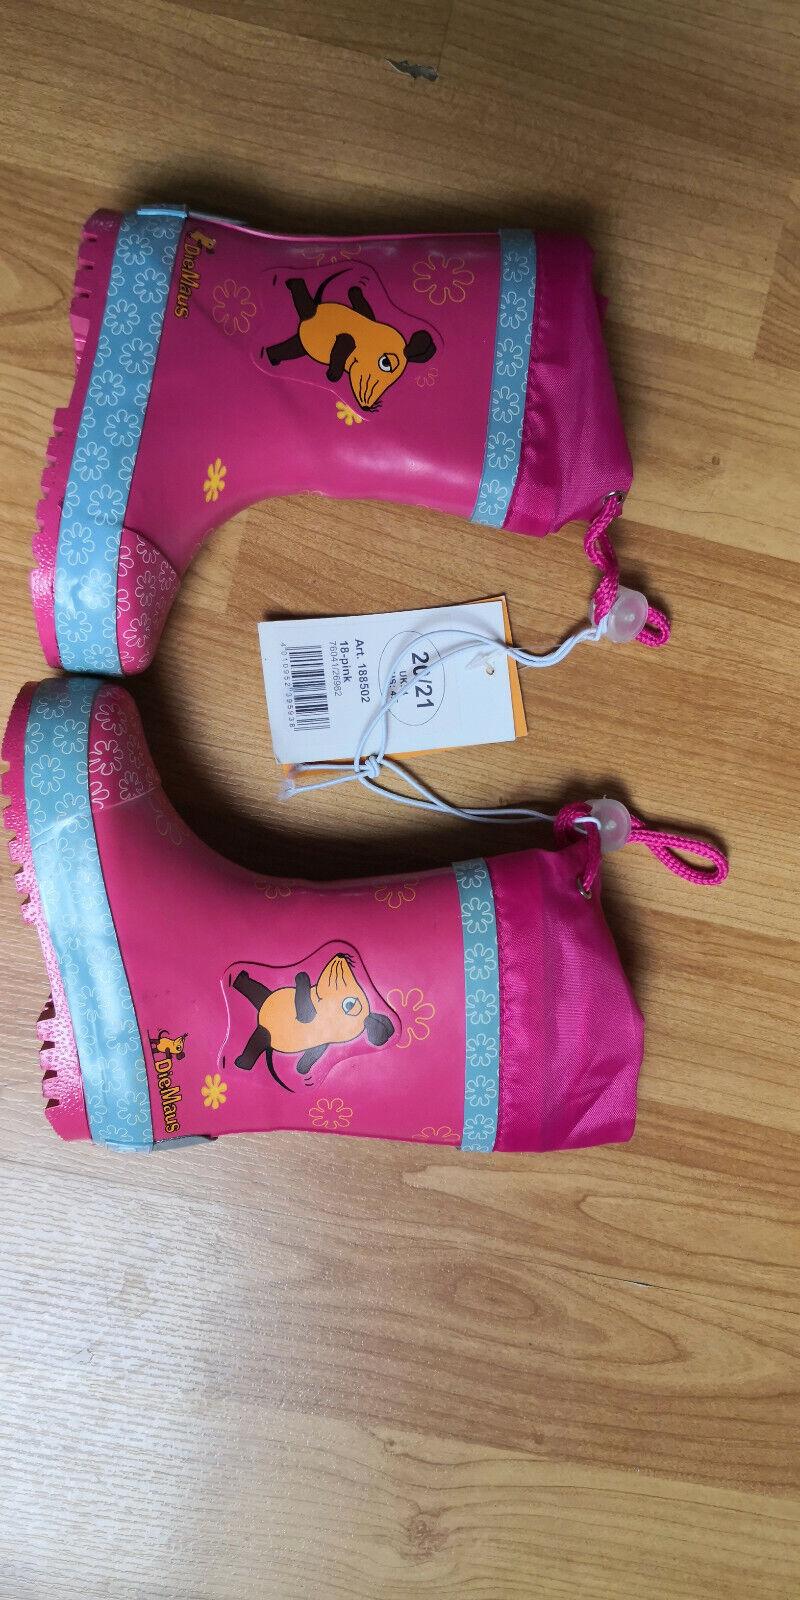 1 Paar Baby Regenstiefel Schuhe die Maus pink rosa Gr.20/21 NEU PLAYSHOES